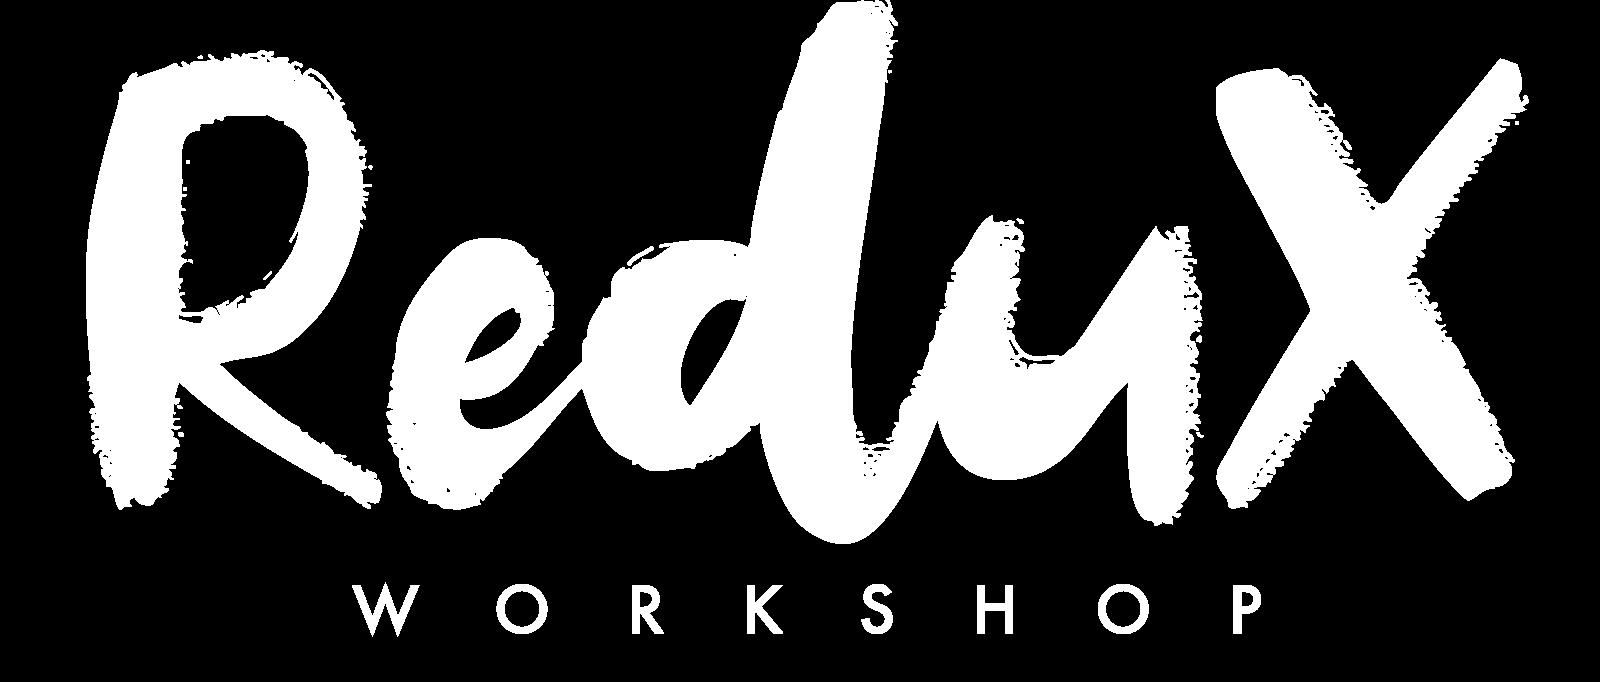 REDUX WORKSHOP